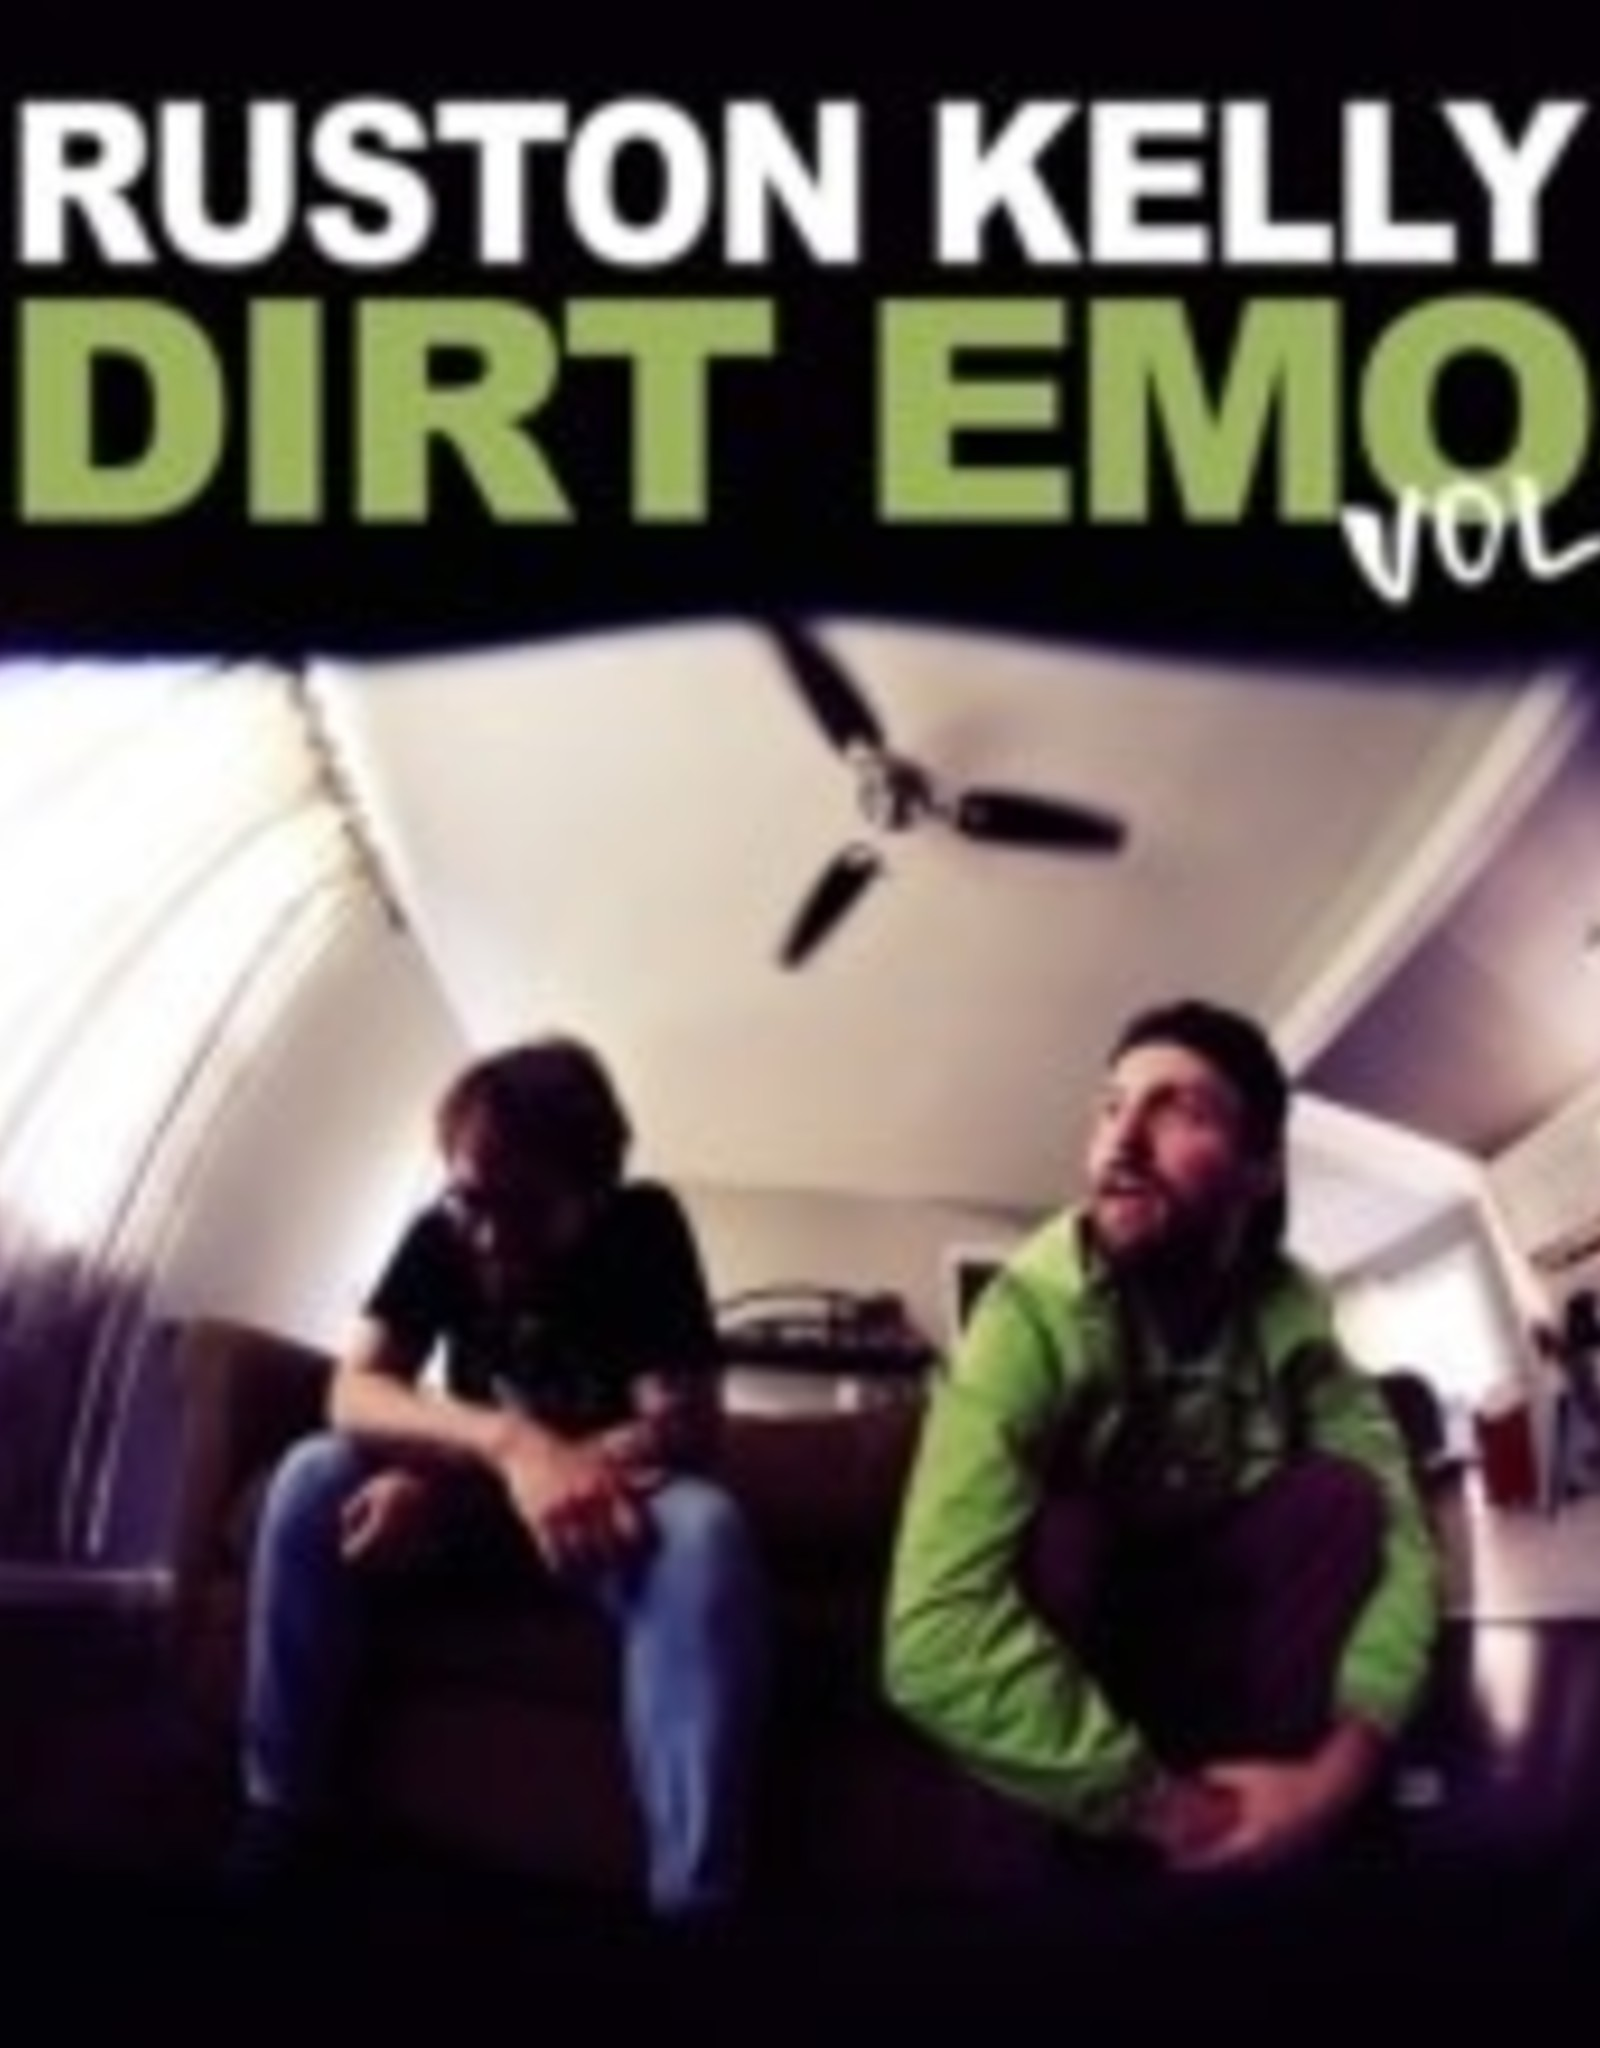 Ruston Kelly - Dirt Emo, Vol. 1 (Pink Vinyl)